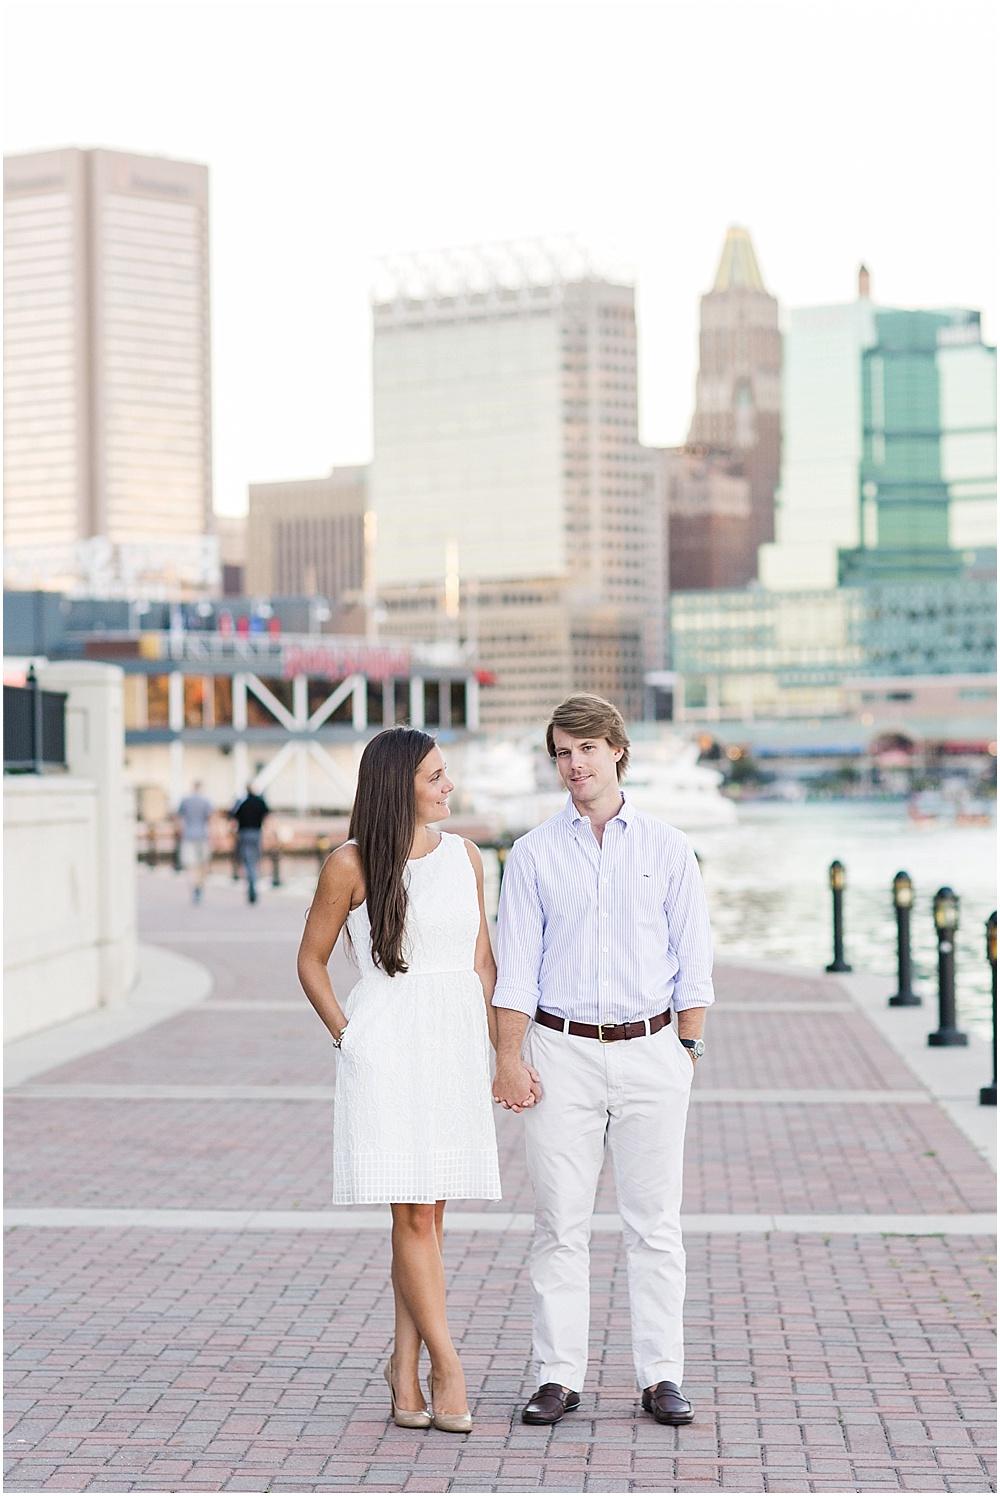 lauren_jon_federal_hill_engagement_session_baltimore_wedding_photographer_0017